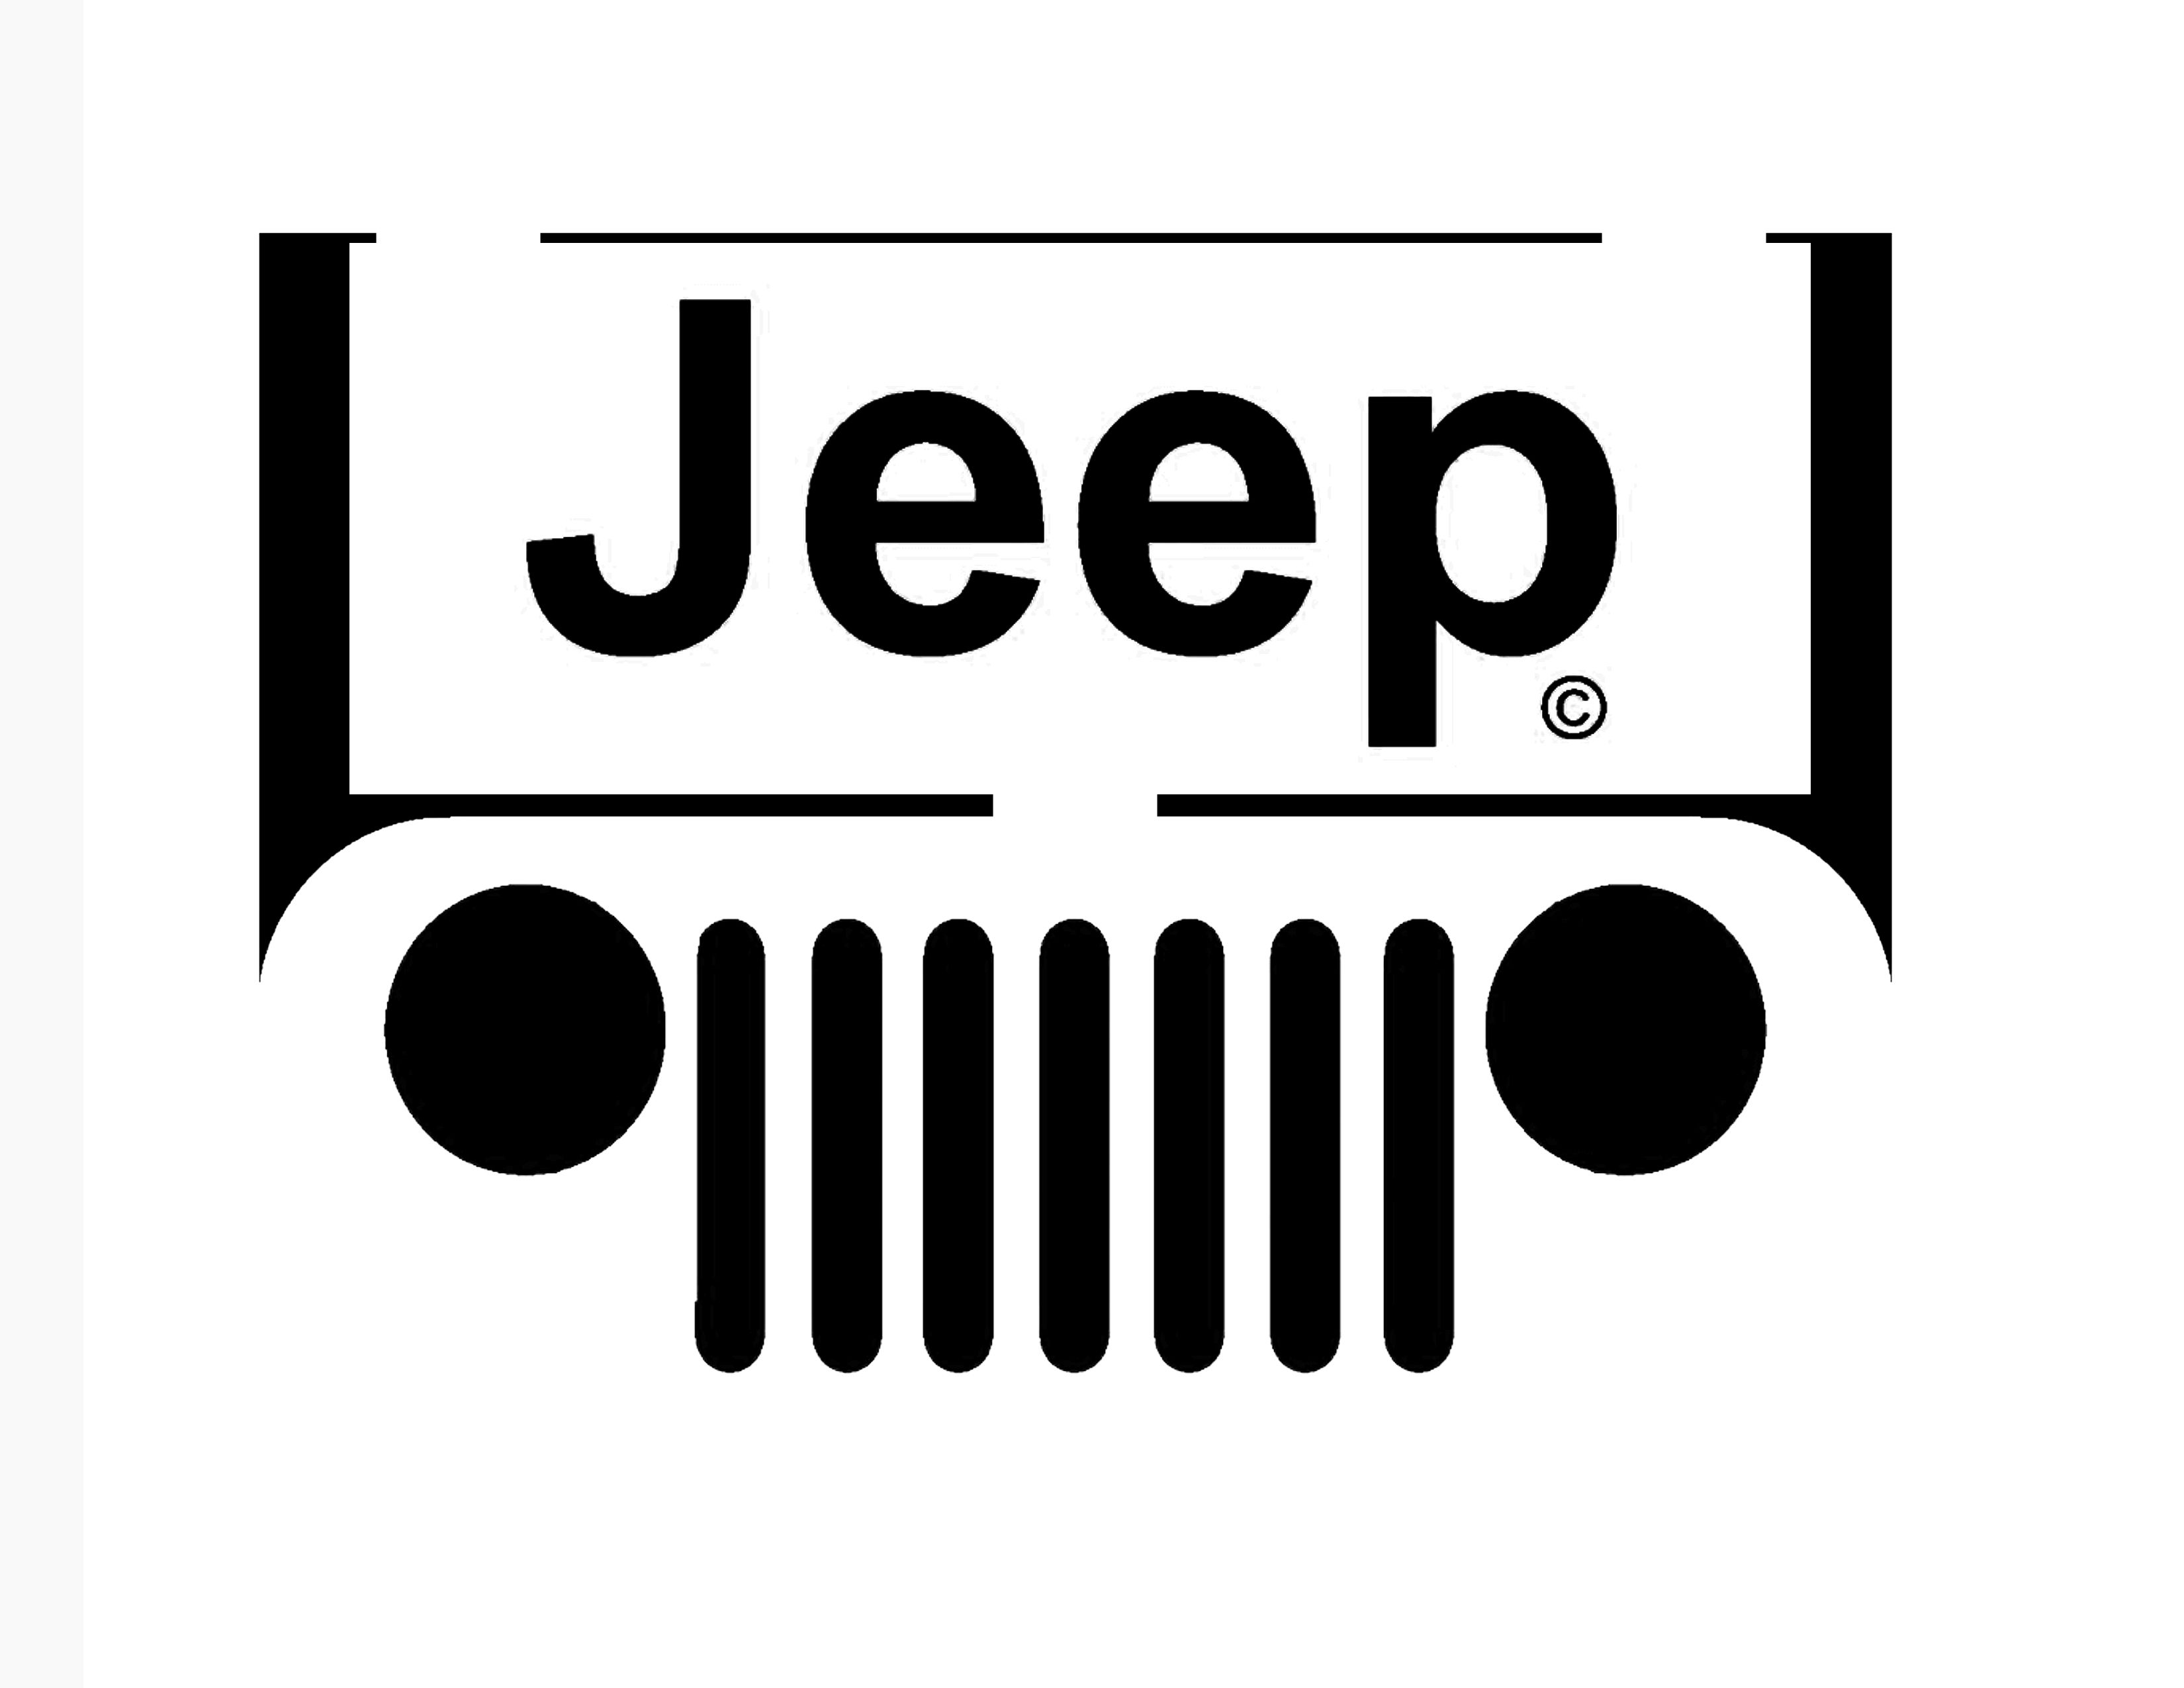 Logo Custom Dog //Cat Paw Print 3D Printed PLA Wrangler Cherokee Jeep Emblems